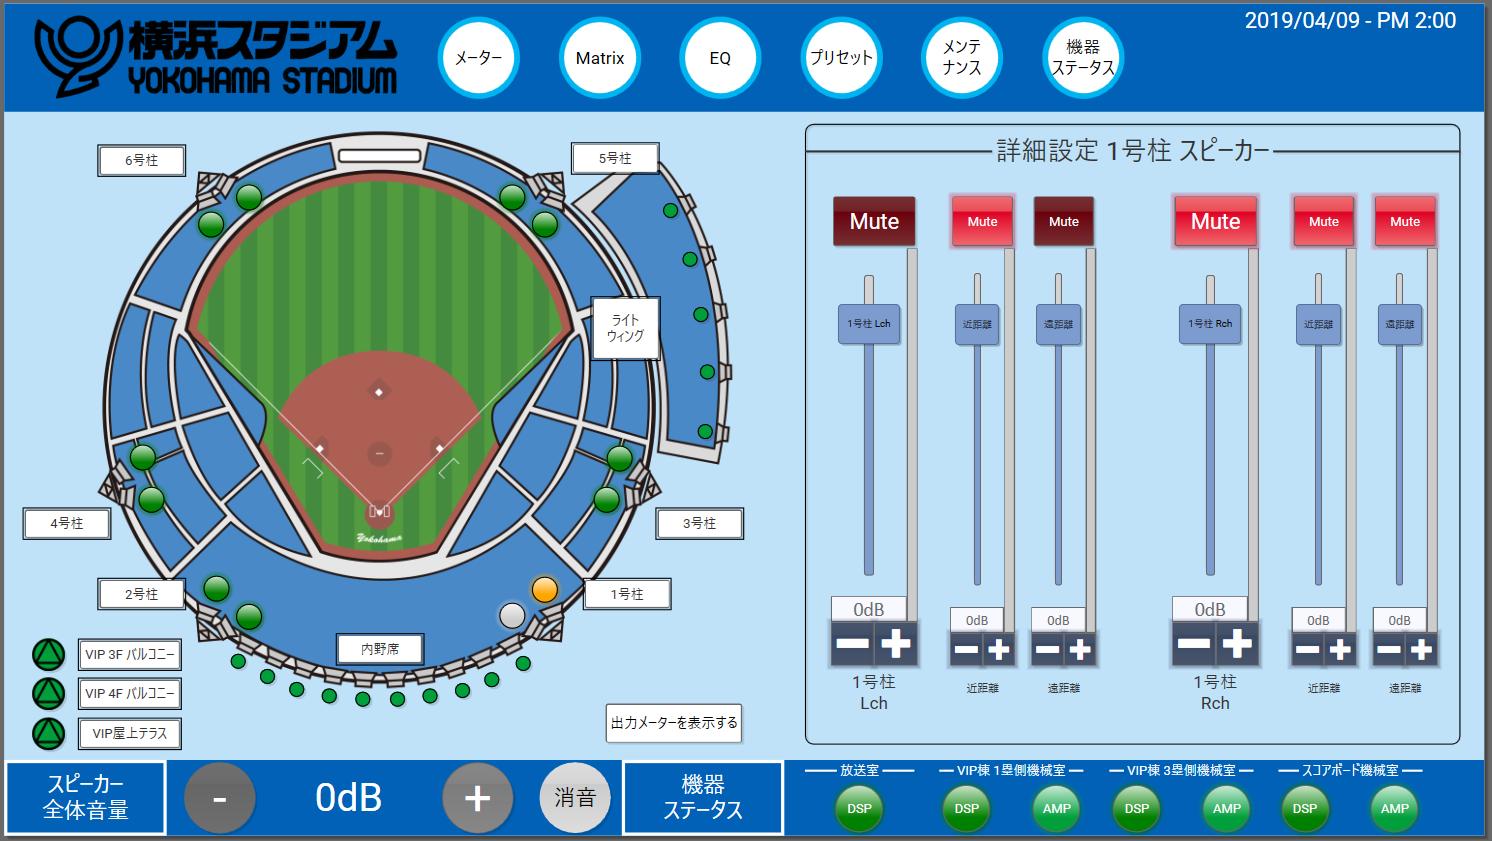 Yokohama Stadium Hits a Home Run with the Q-SYS Audio, Video